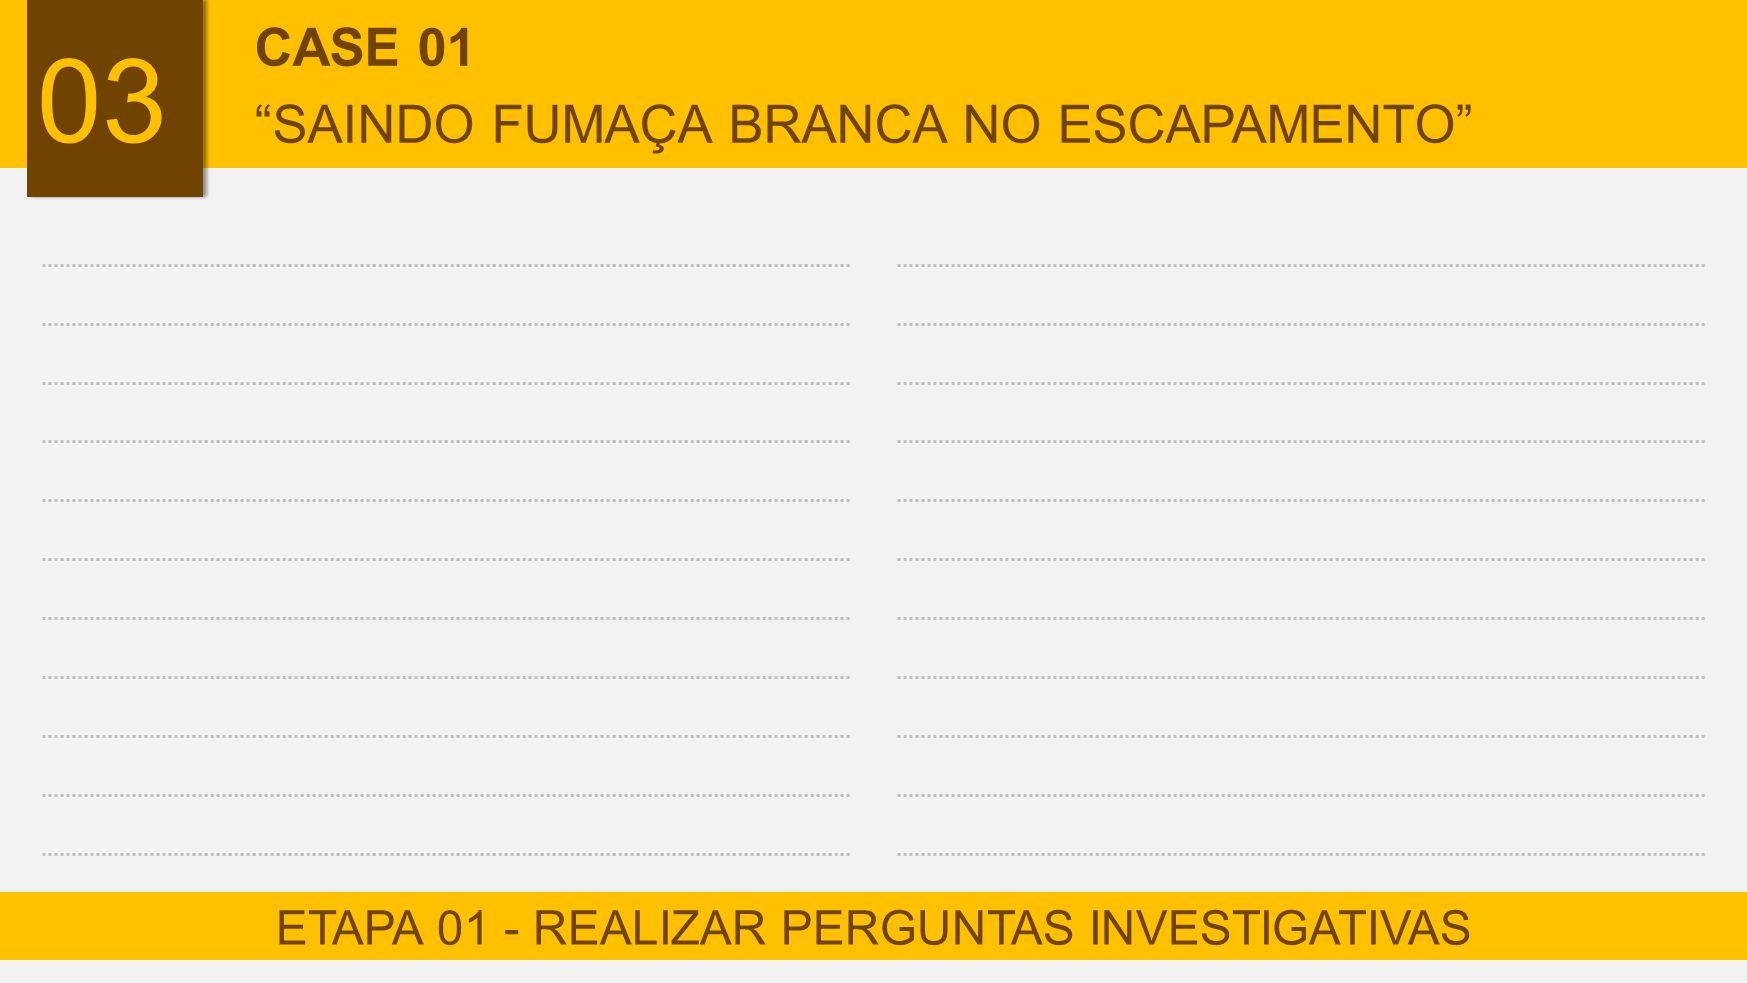 "03 ETAPA 01 - REALIZAR PERGUNTAS INVESTIGATIVAS CASE 01 ""SAINDO FUMAÇA BRANCA NO ESCAPAMENTO"""